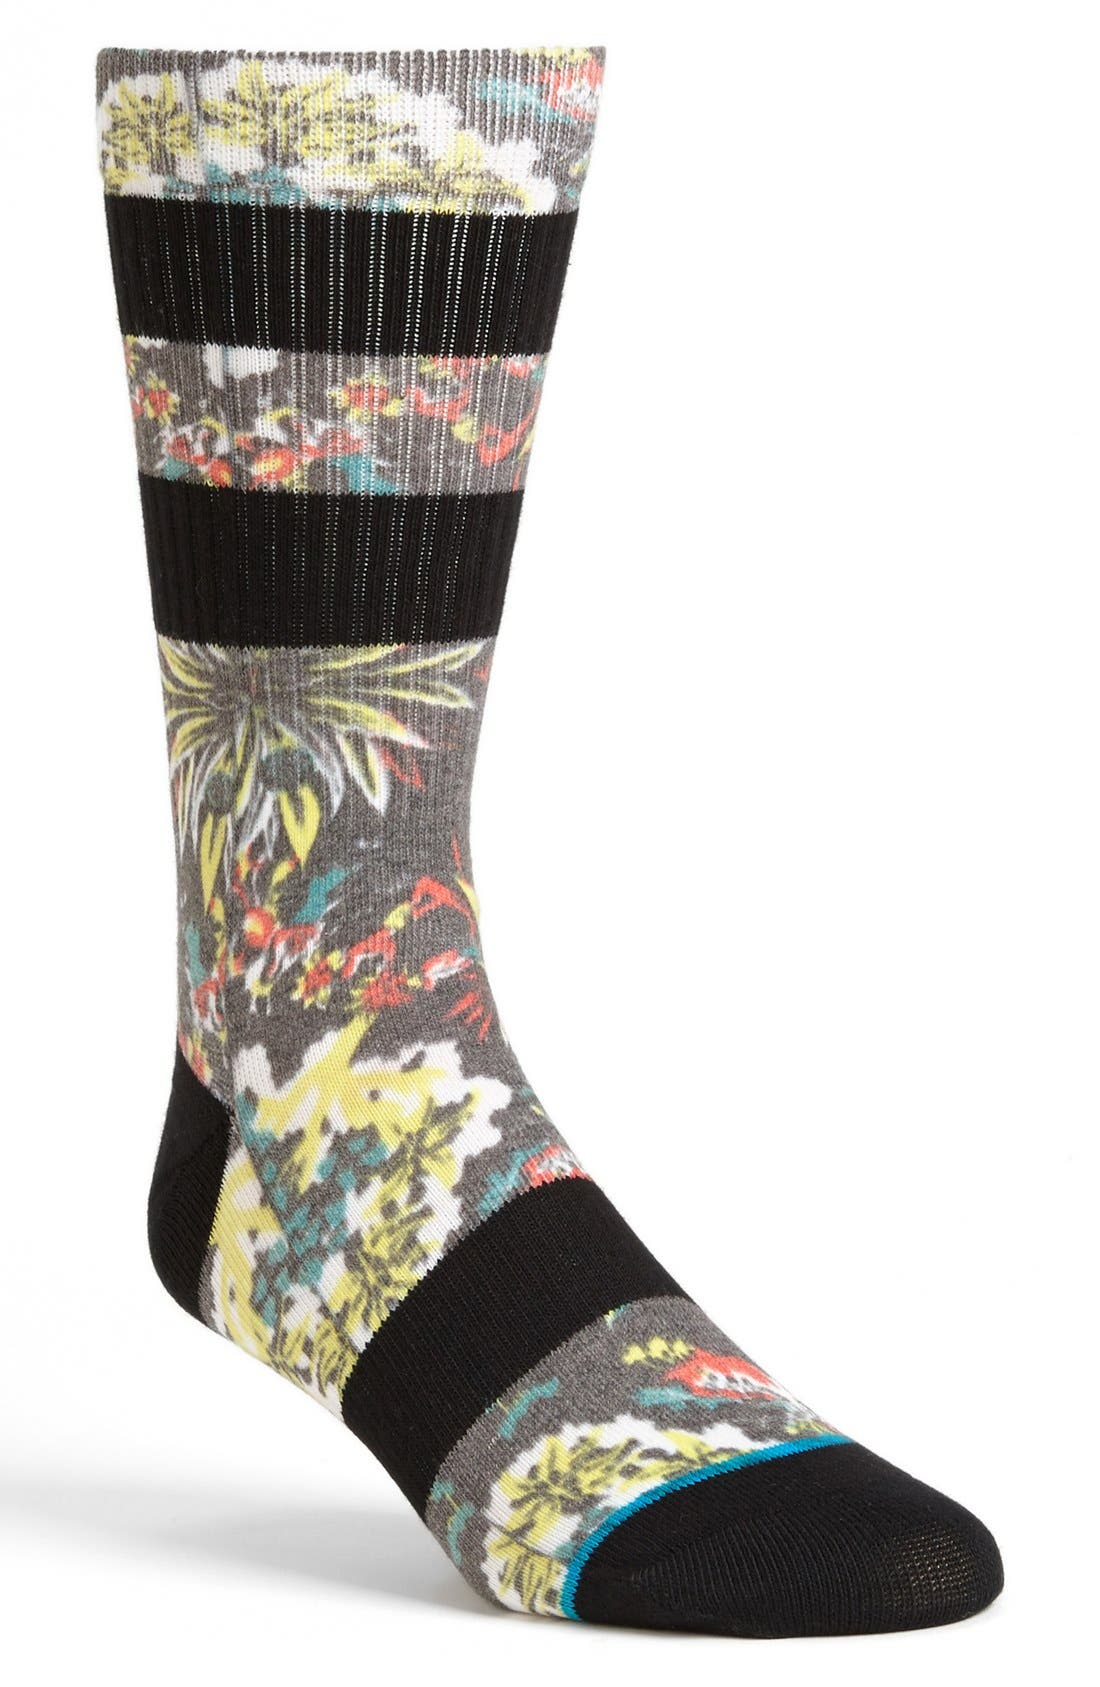 Alternate Image 1 Selected - Stance 'Kamea' Socks